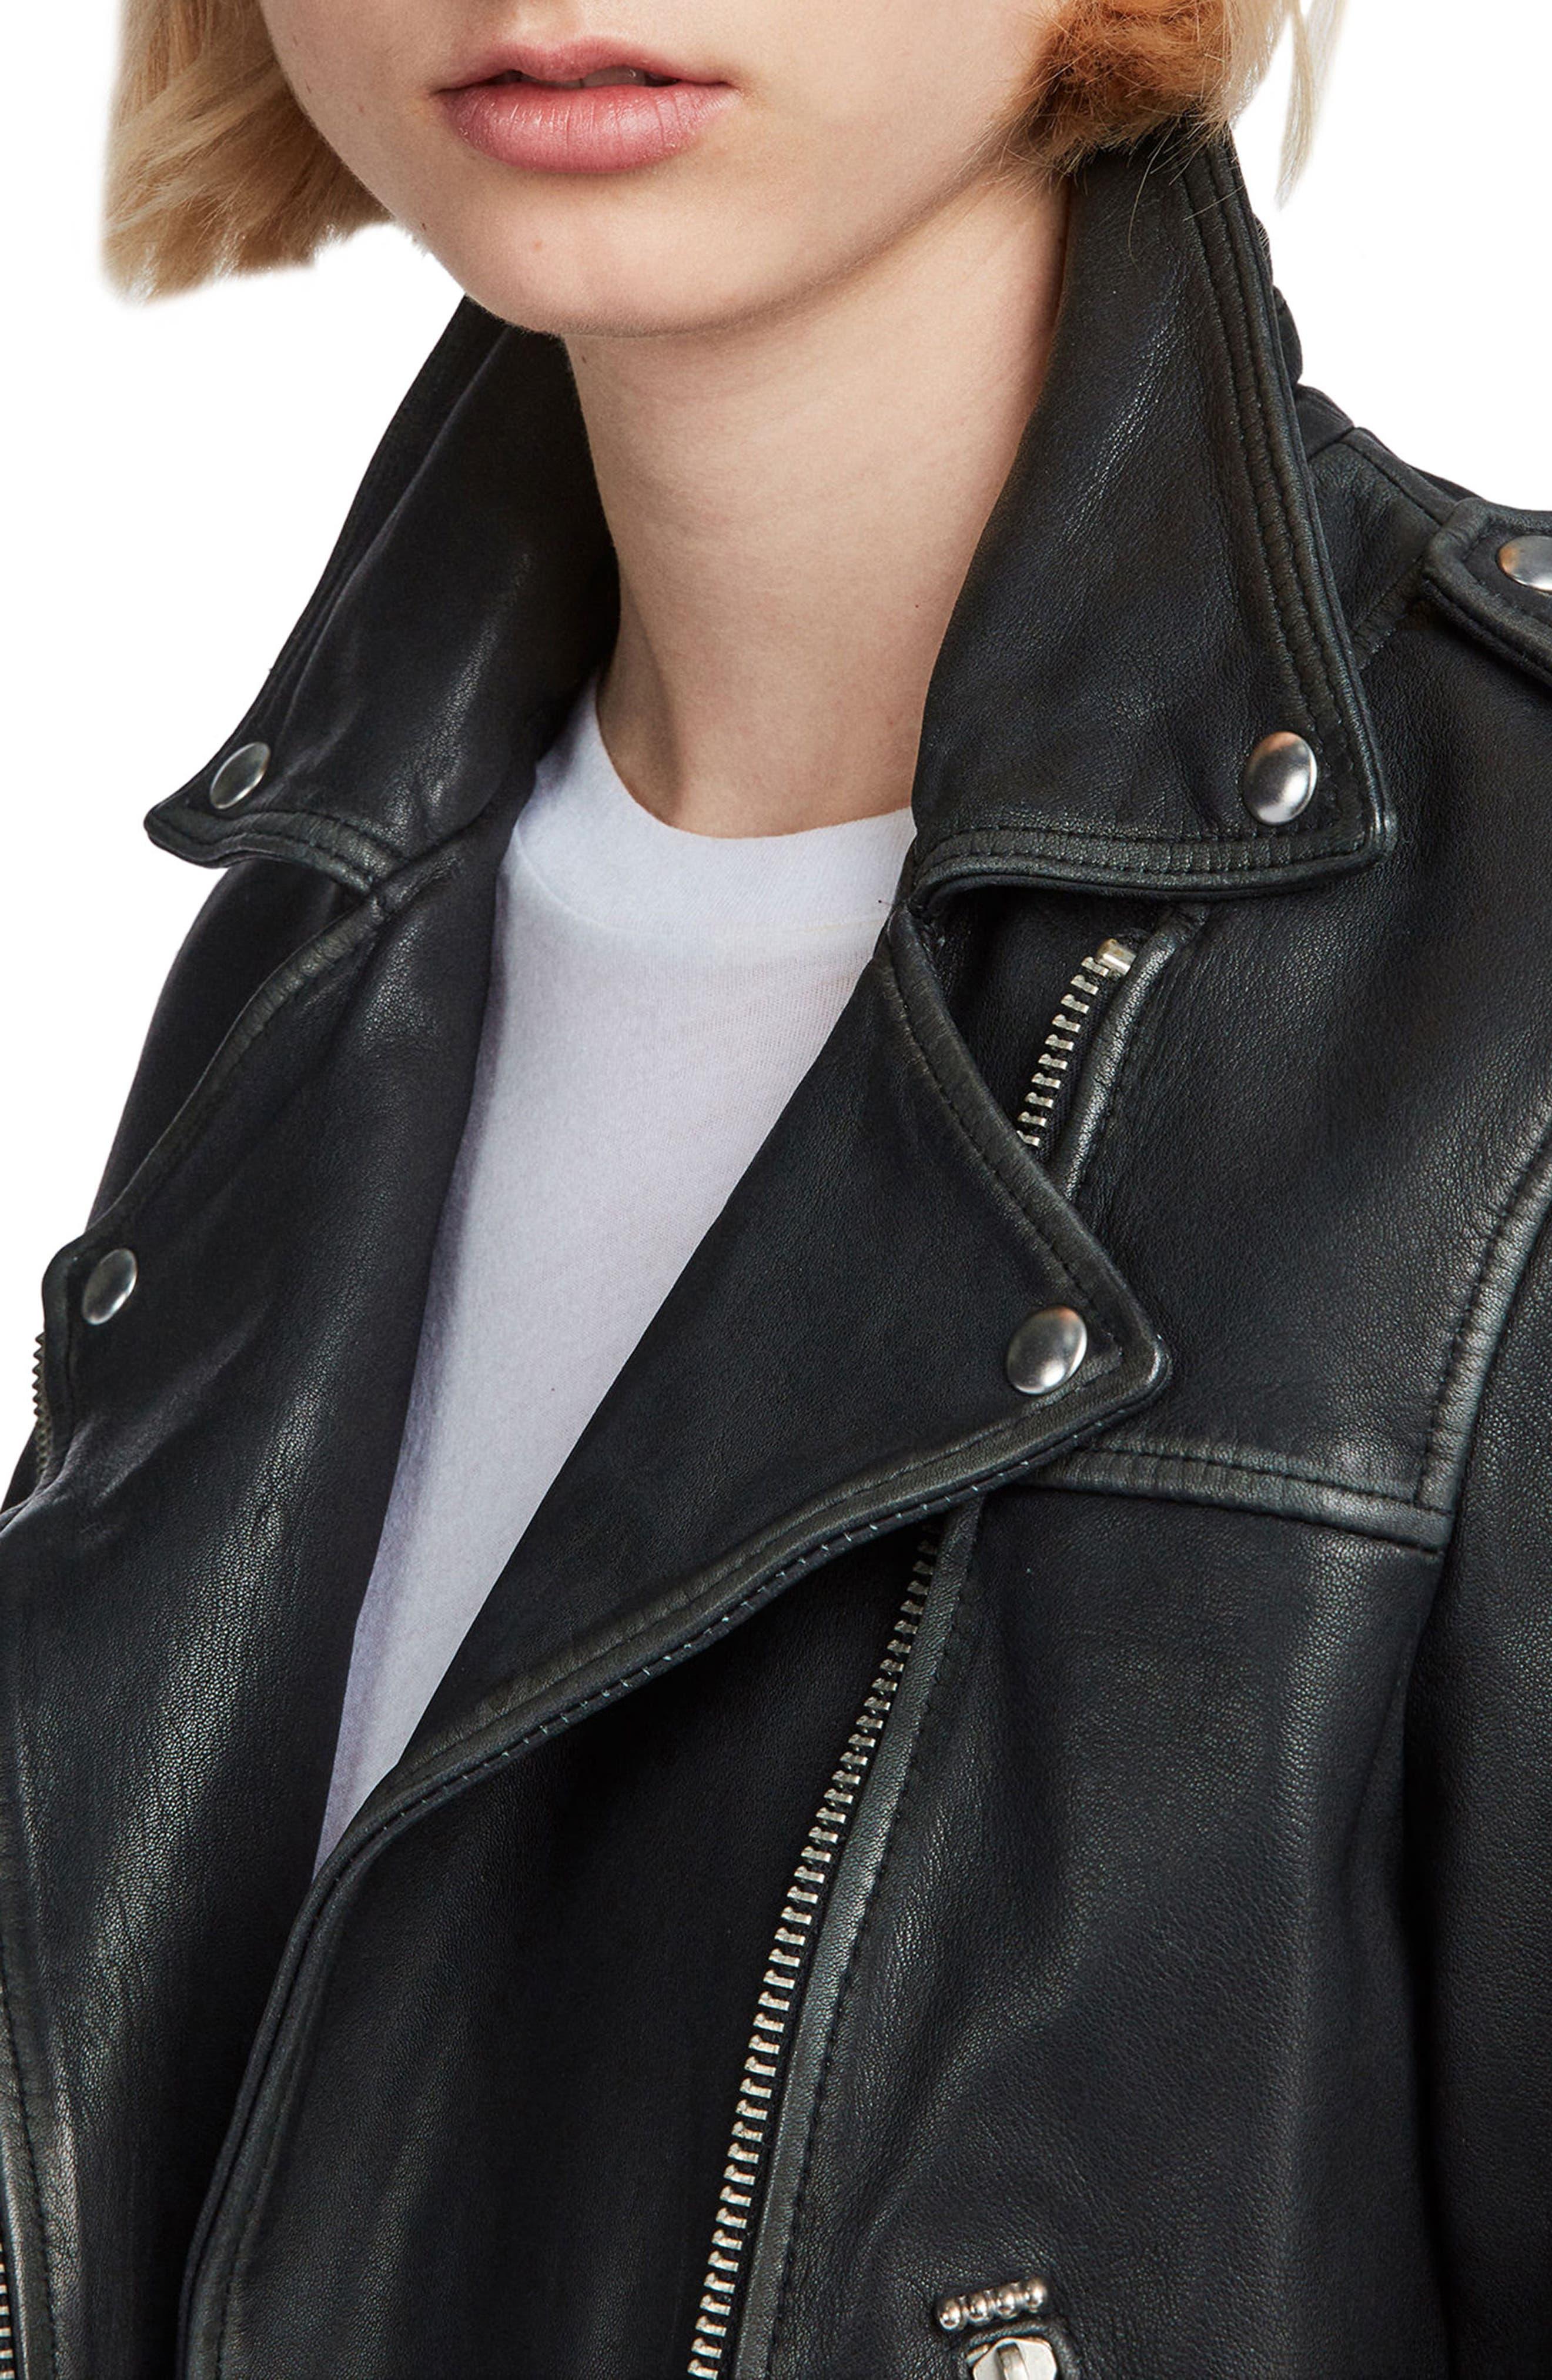 Lara Sheepskin Leather Biker Jacket,                             Alternate thumbnail 5, color,                             Black